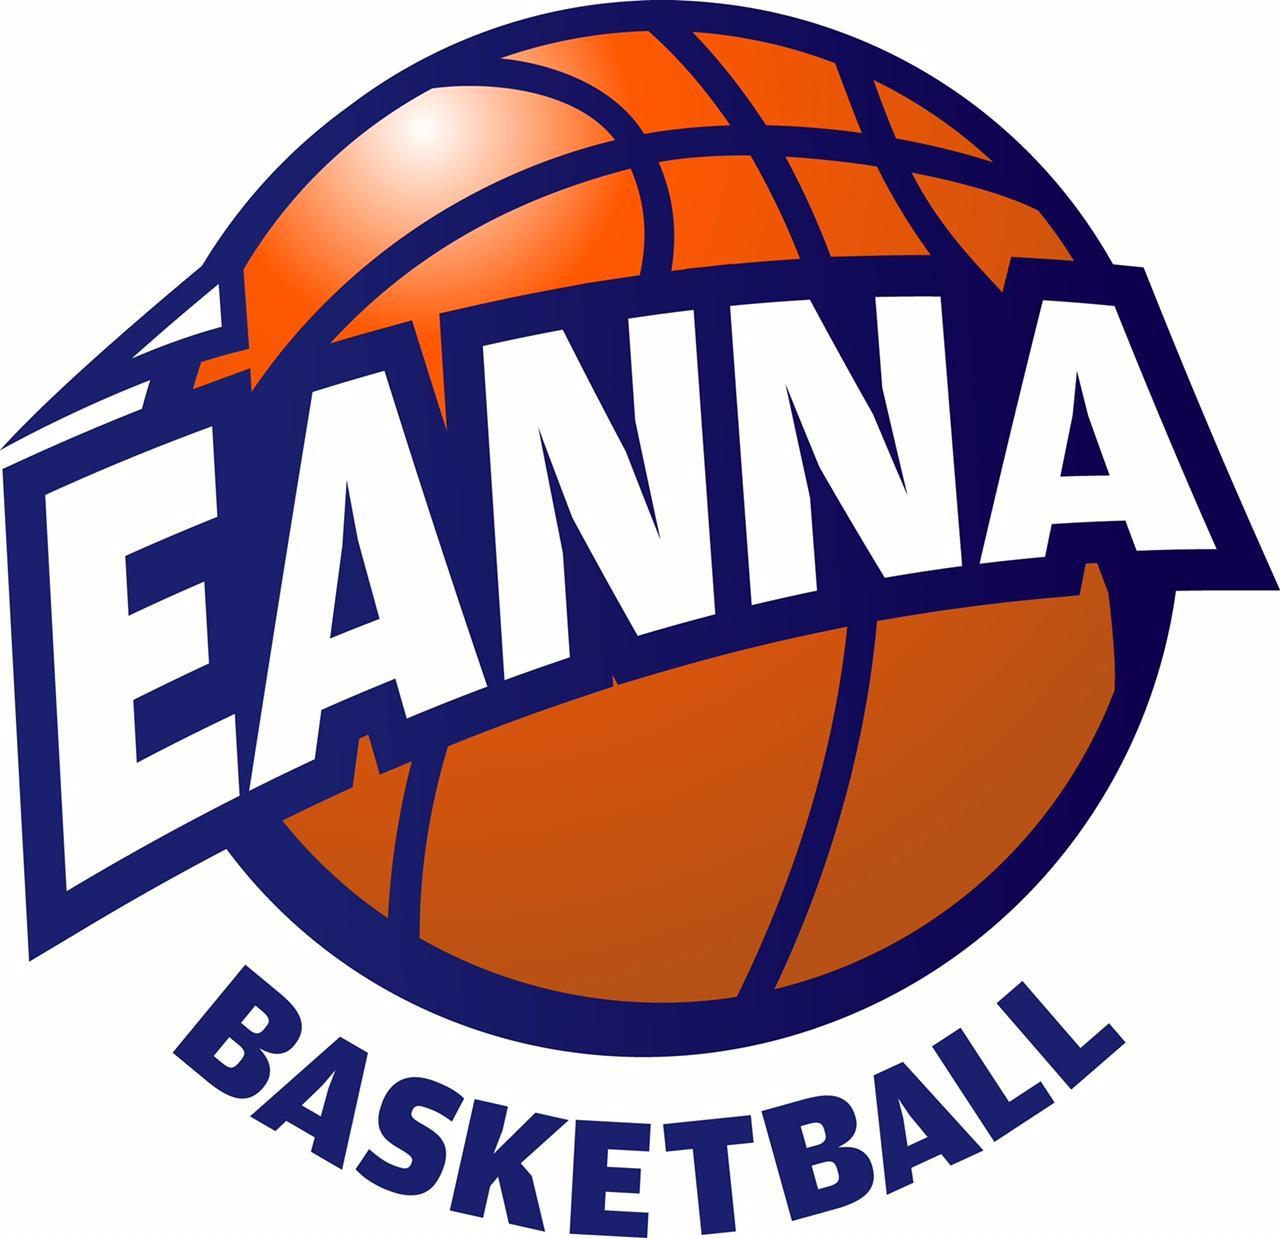 Éanna Basketball Superleague 2017/2018 Season Pass